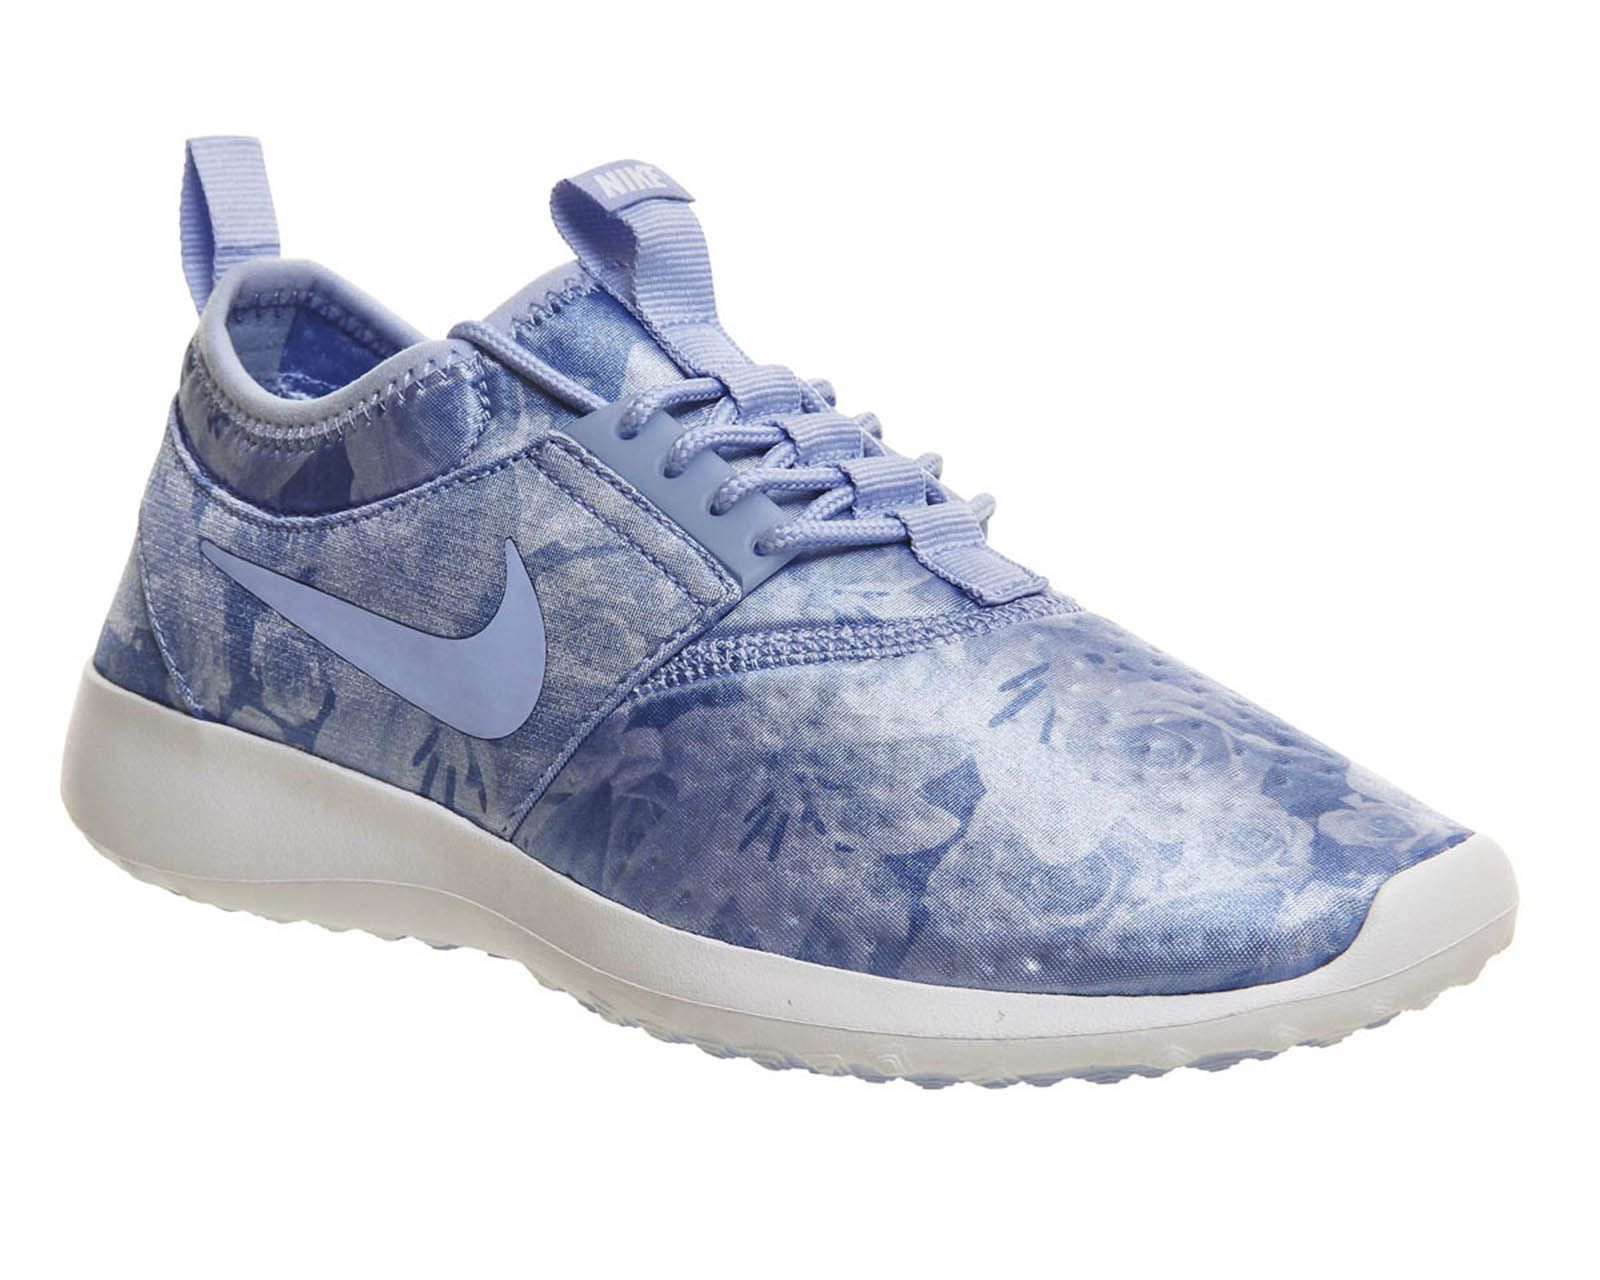 Comprar Aluminio Azul Floral W De Nike Juvenate De W Volver 1ac79d